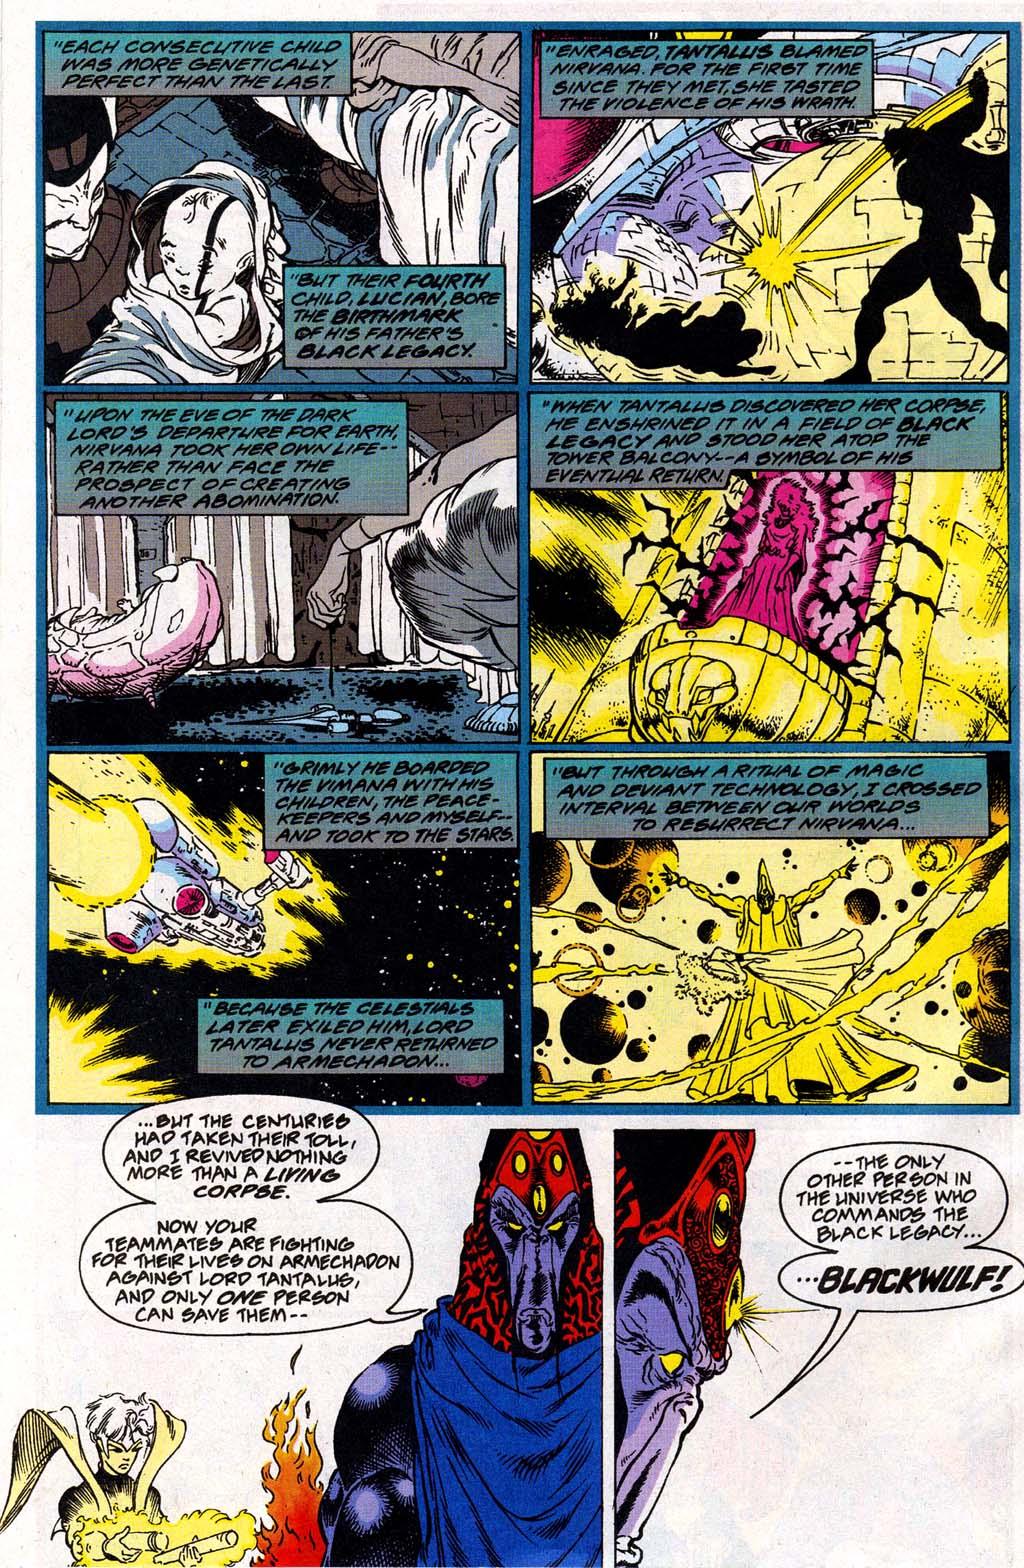 Read online Blackwulf comic -  Issue #9 - 15